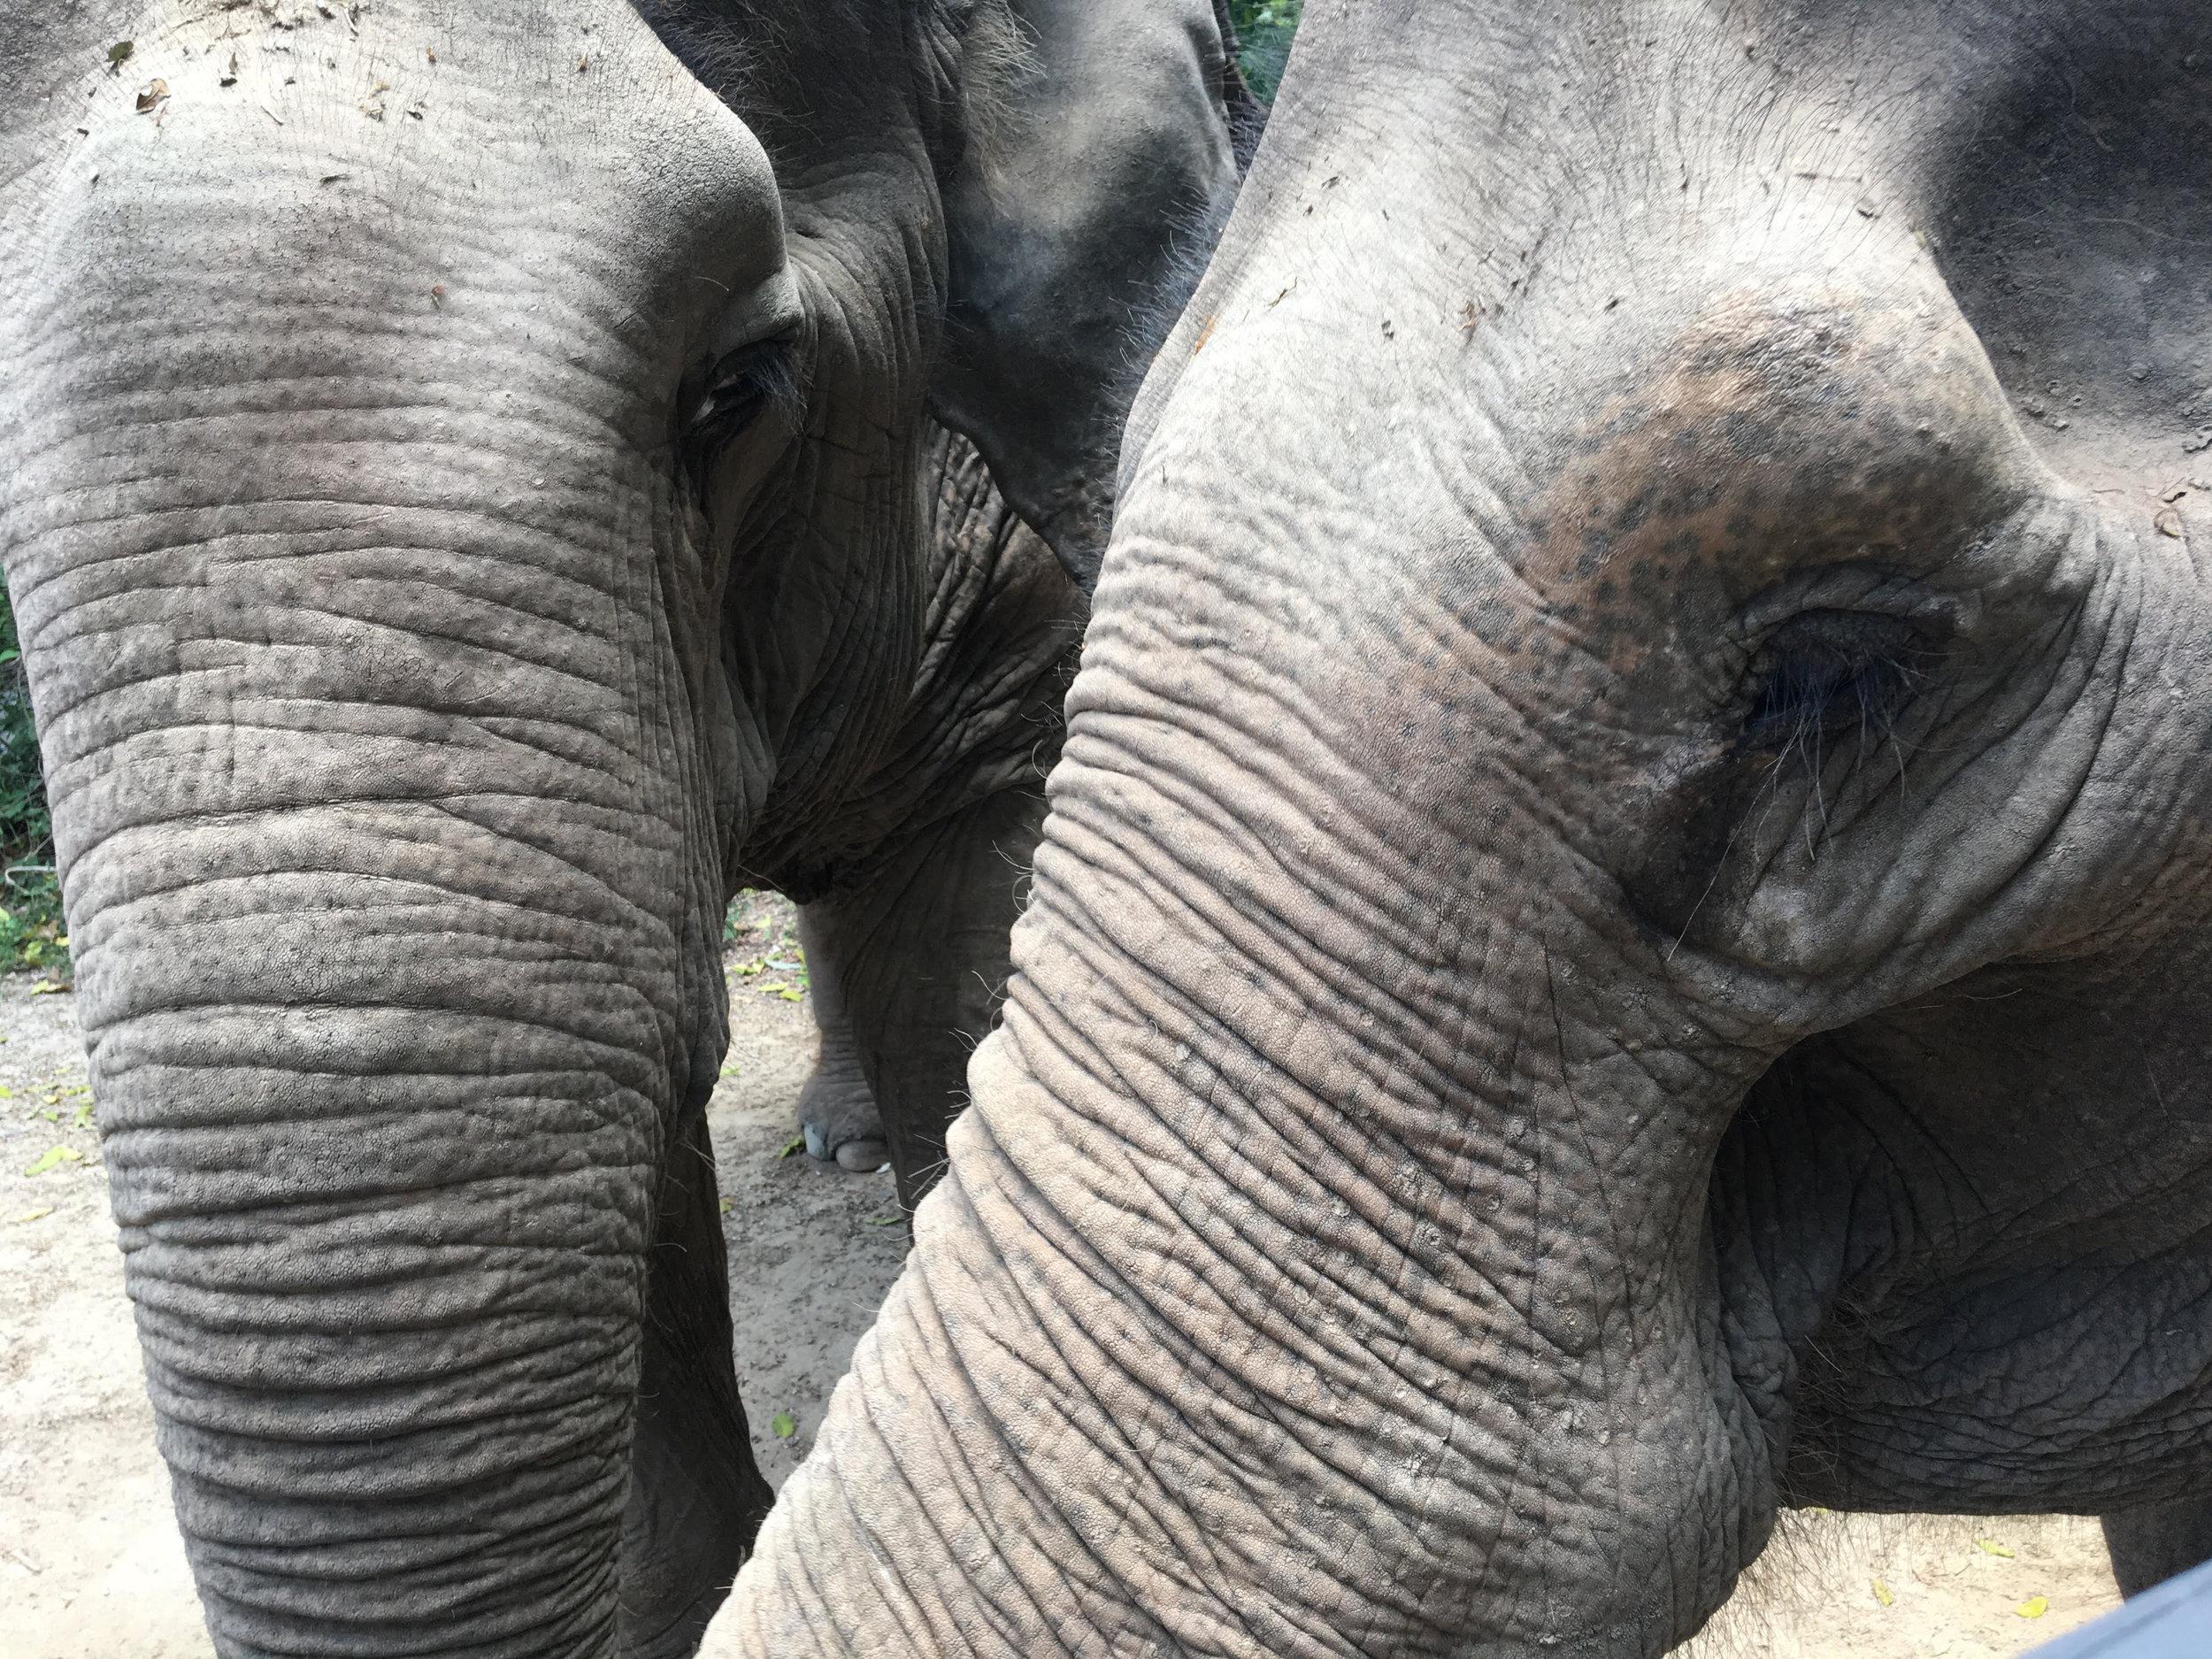 elephant 2018.jpg